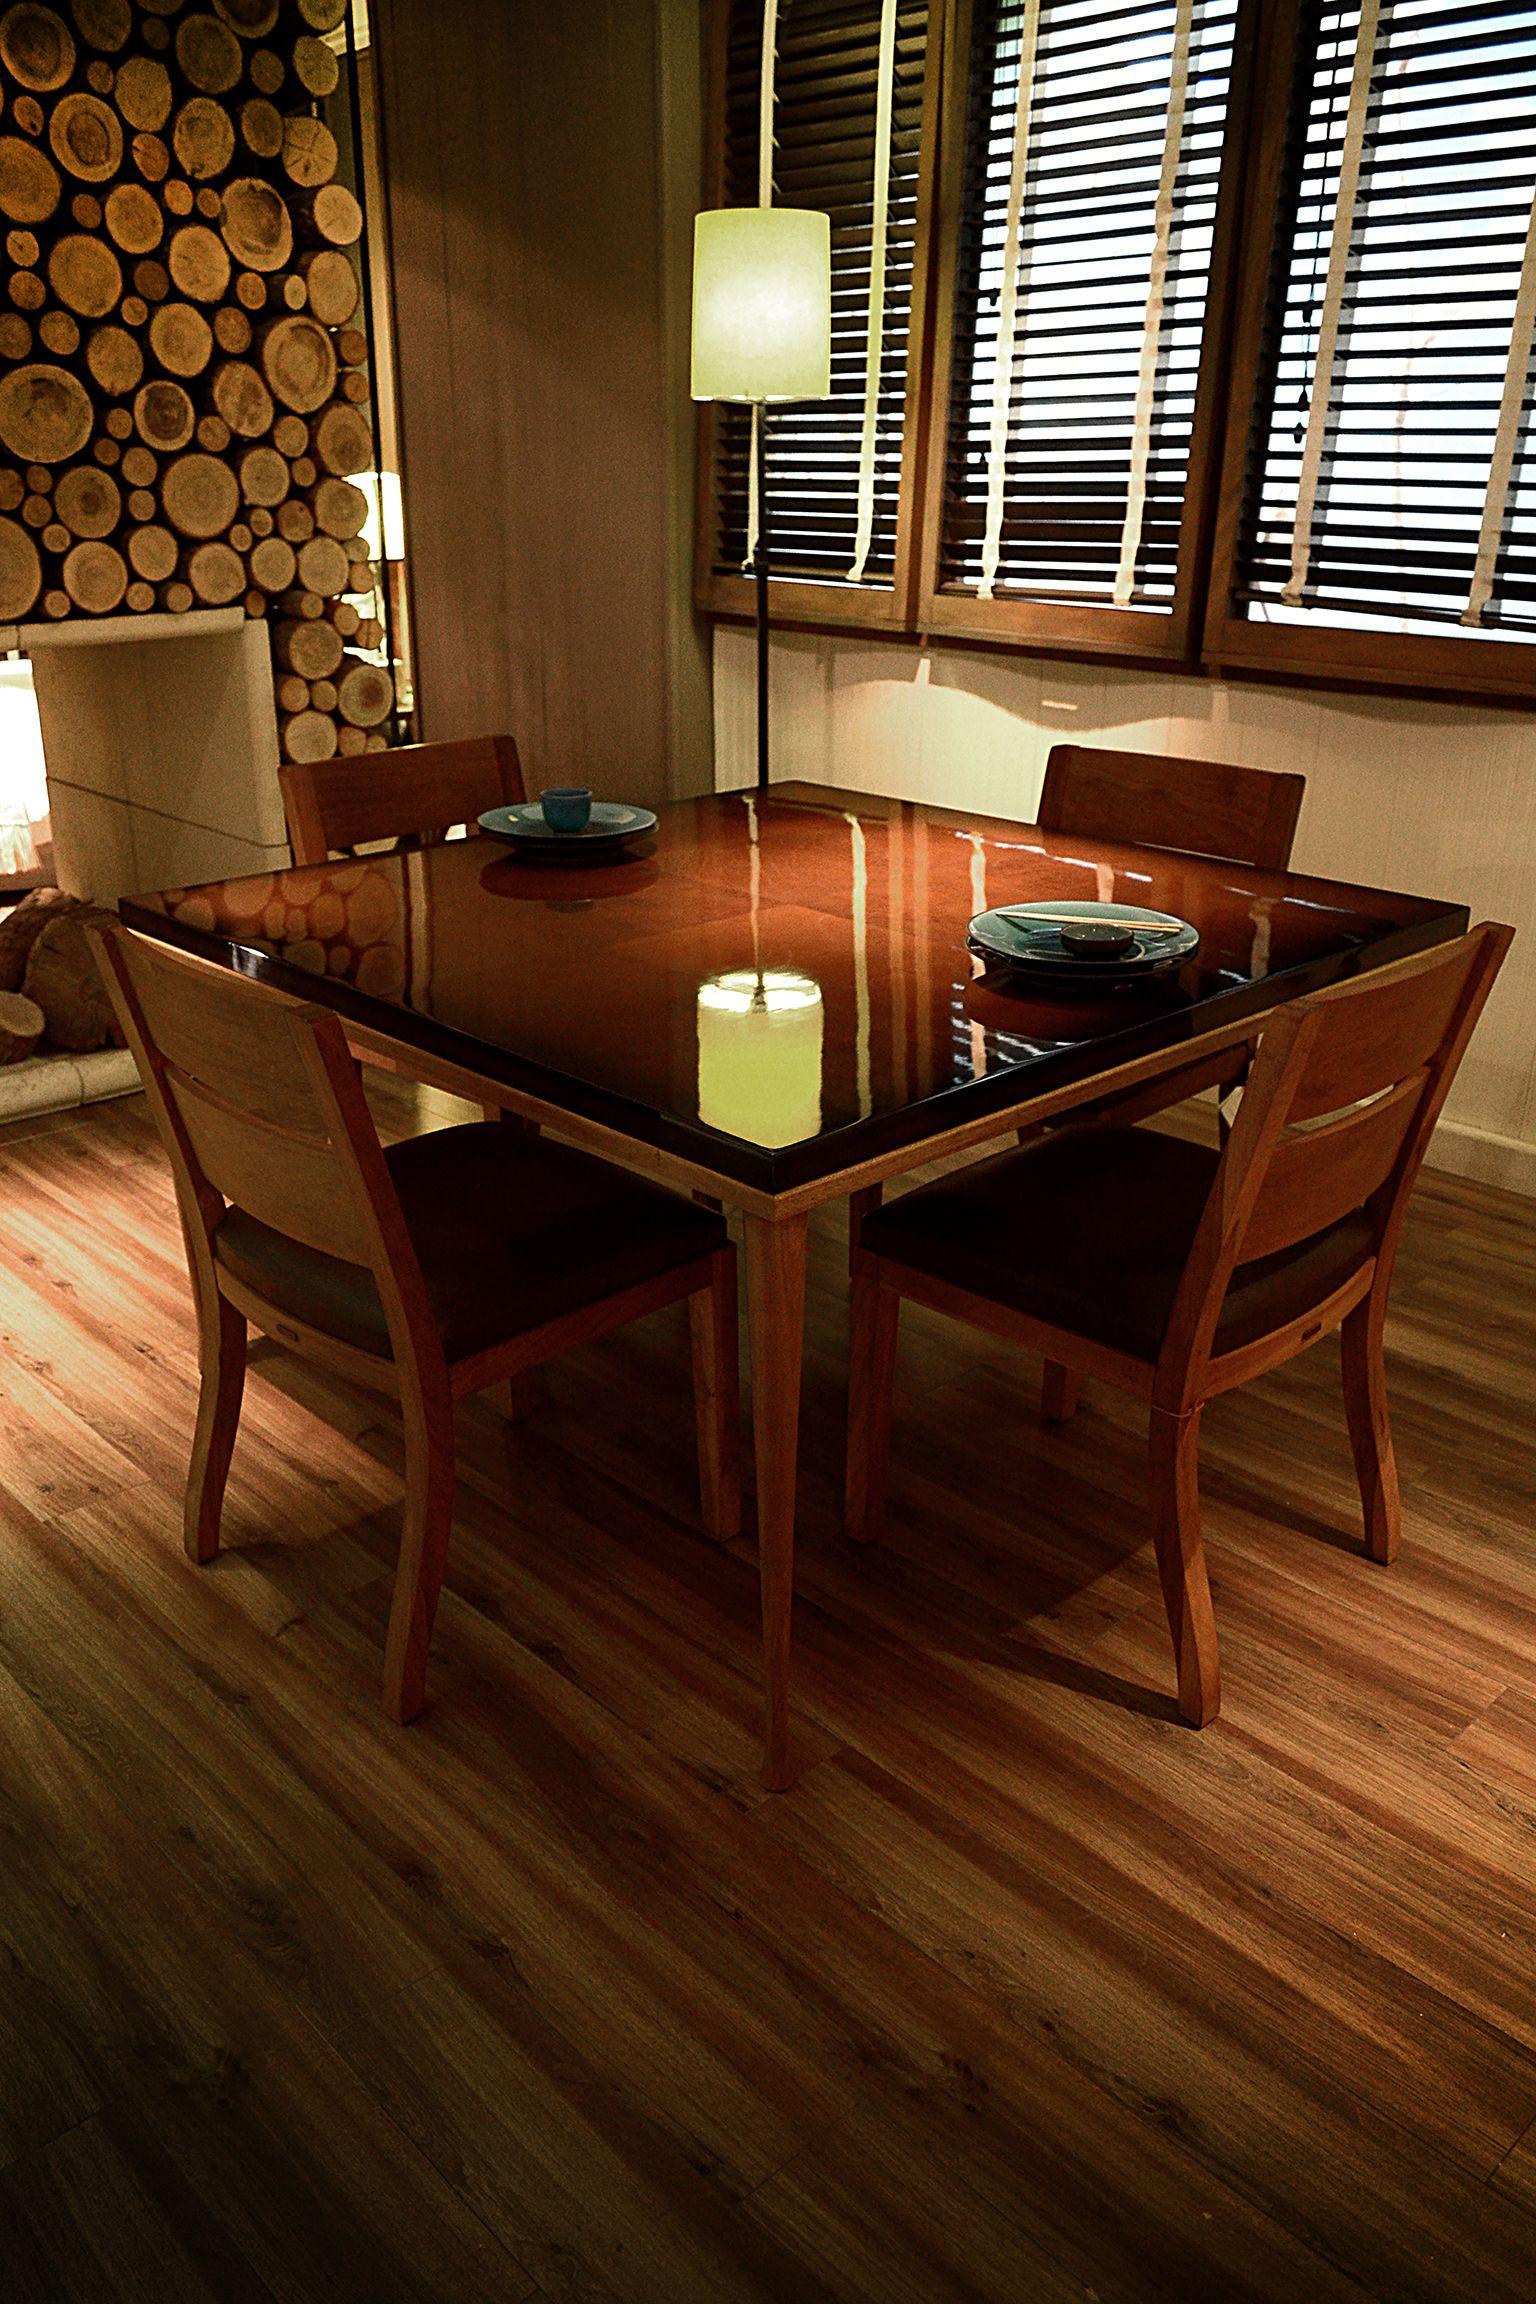 Mesa de comedor cuadrada recomendada para lugares m s for Mesas comedores pequenos